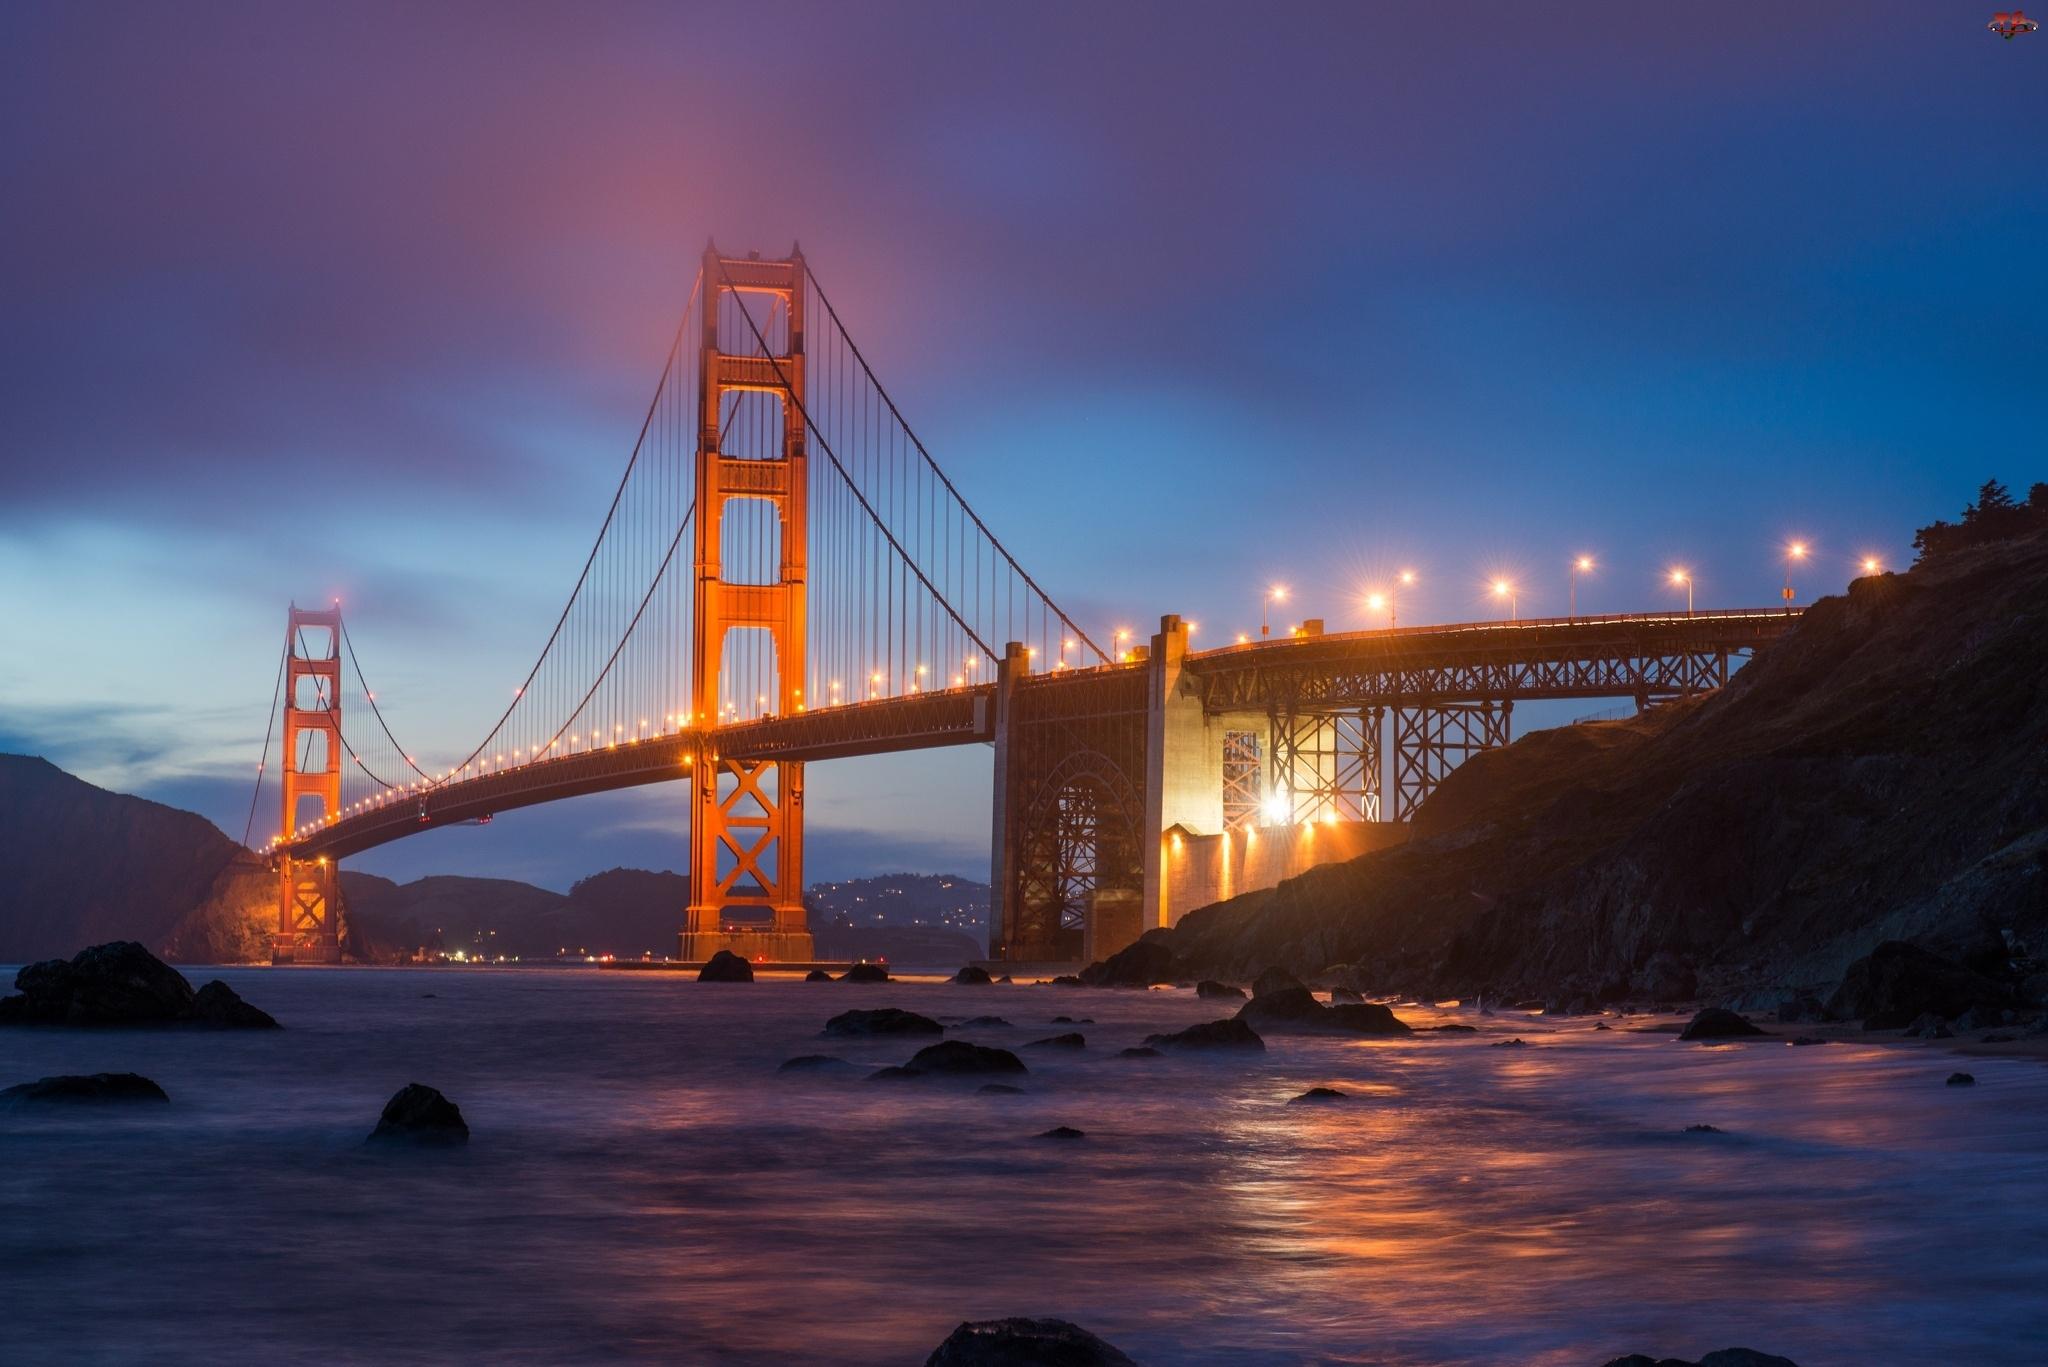 Golden Gate, Oświetlony, Most